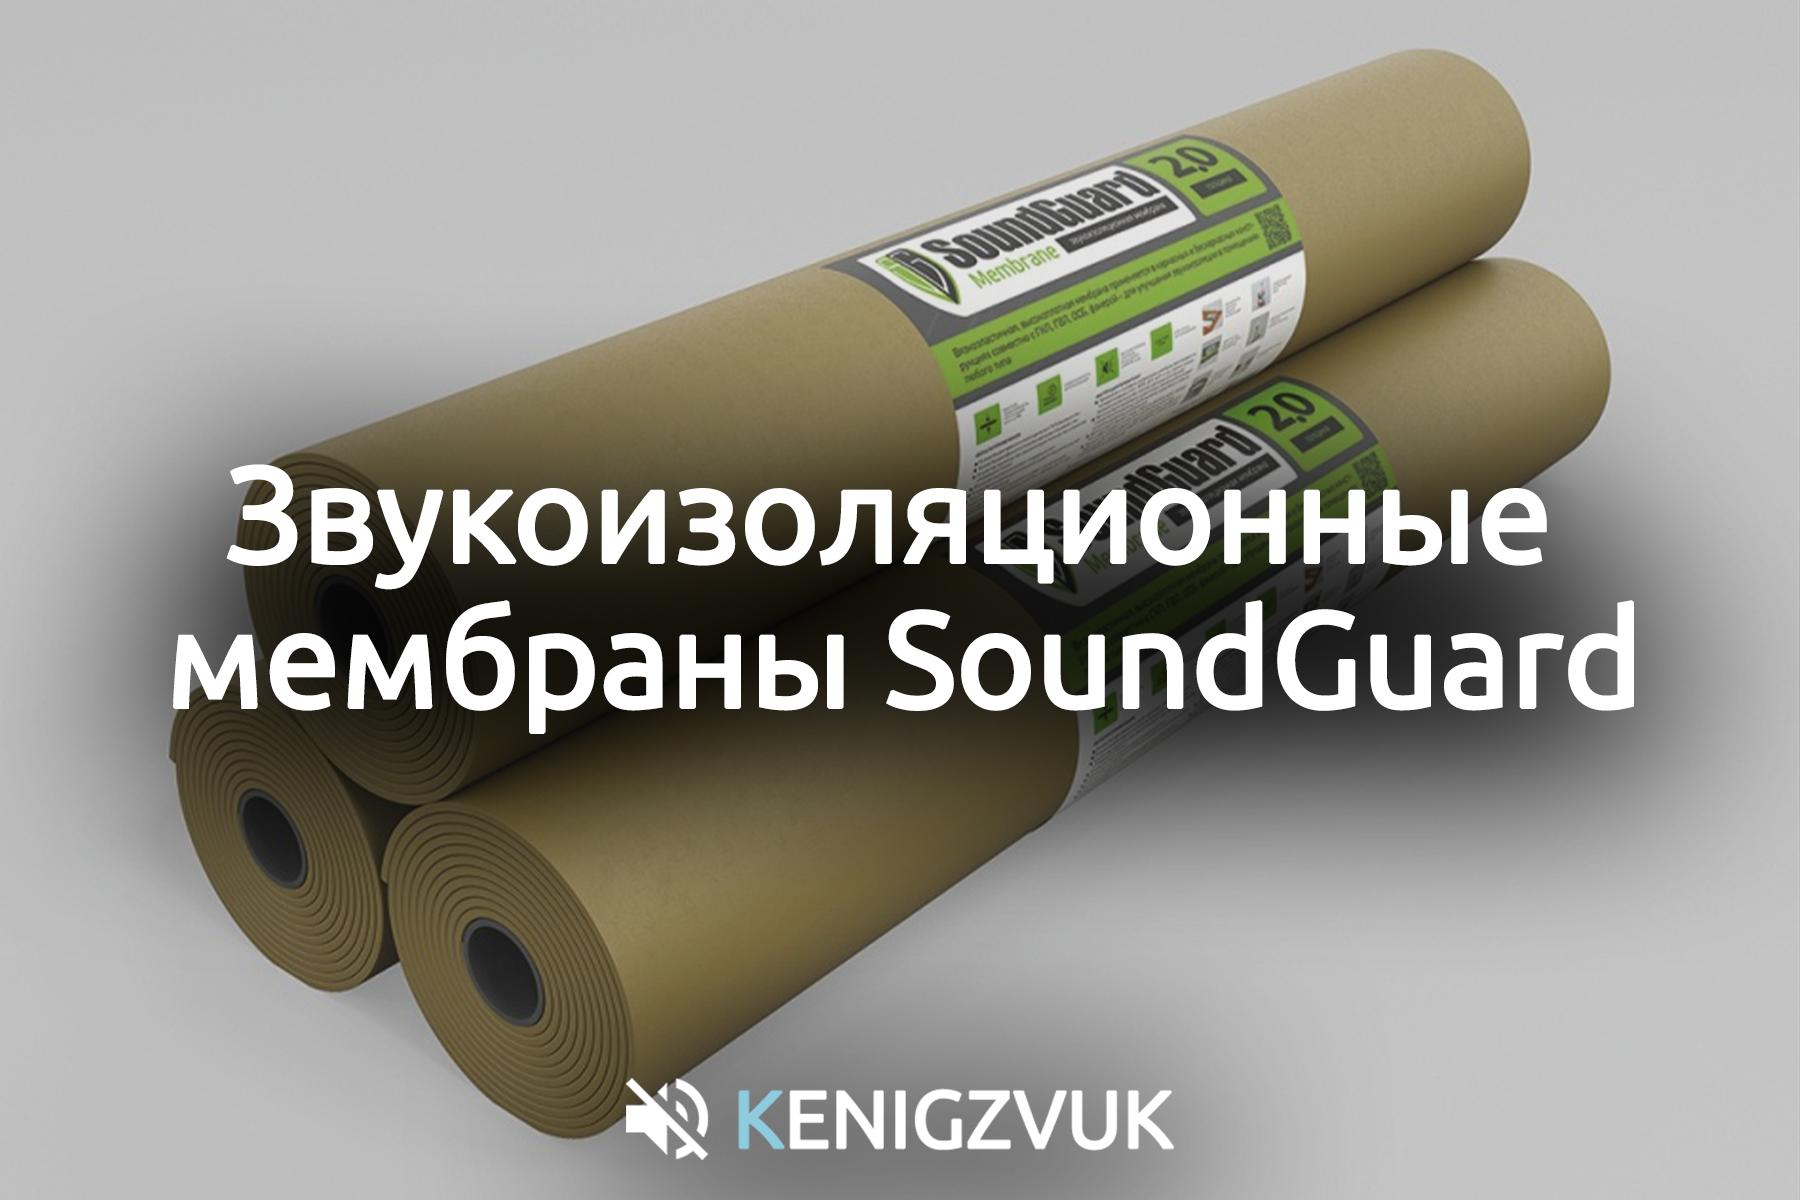 KenigZvuk   Звукоизоляция Калининград -Звукоизоляционные мембраны SoundGuard